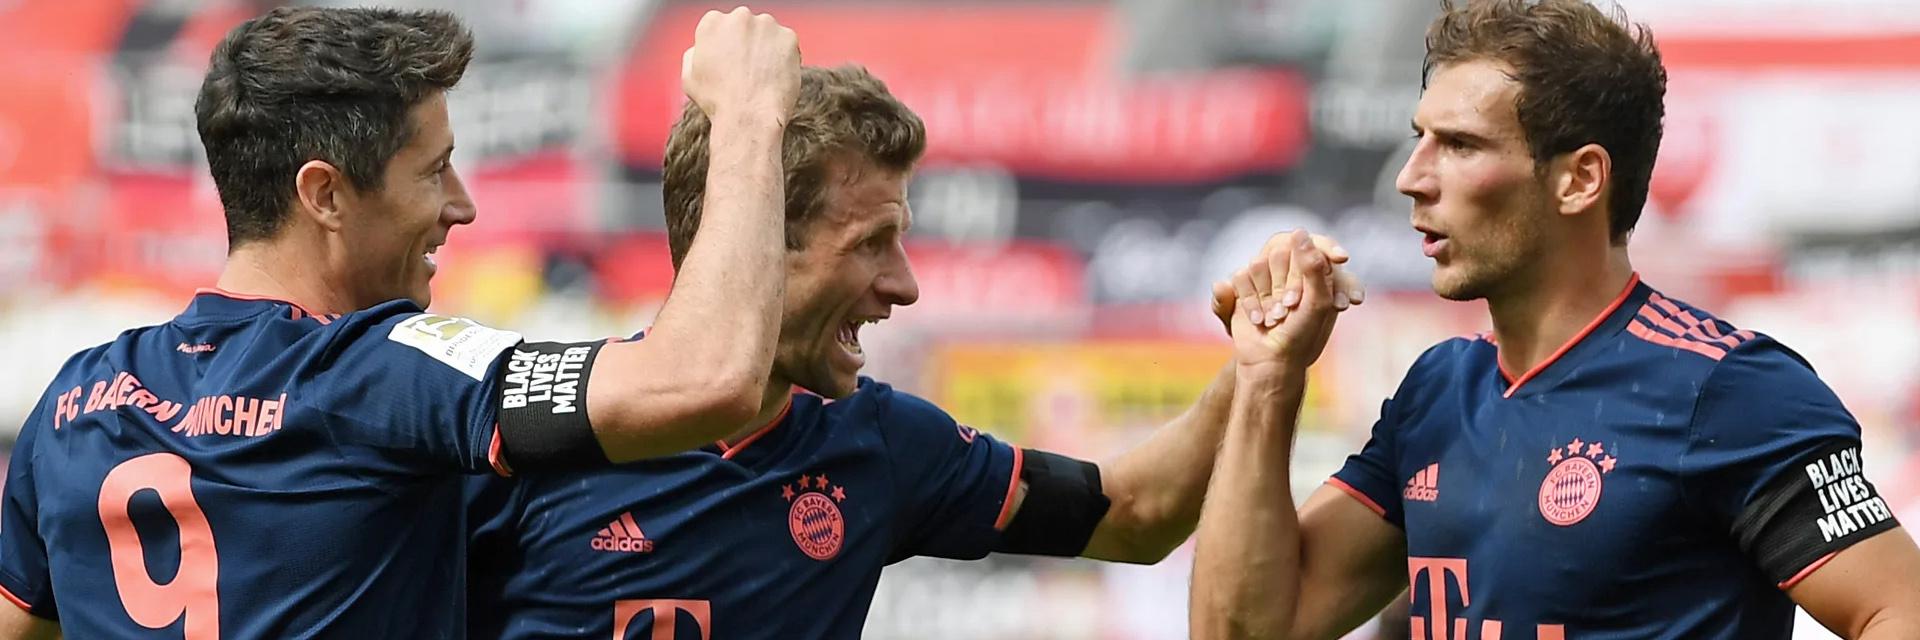 Frankfurt Vs Bayern Munich Game Info DFB-Pokal Semifinals